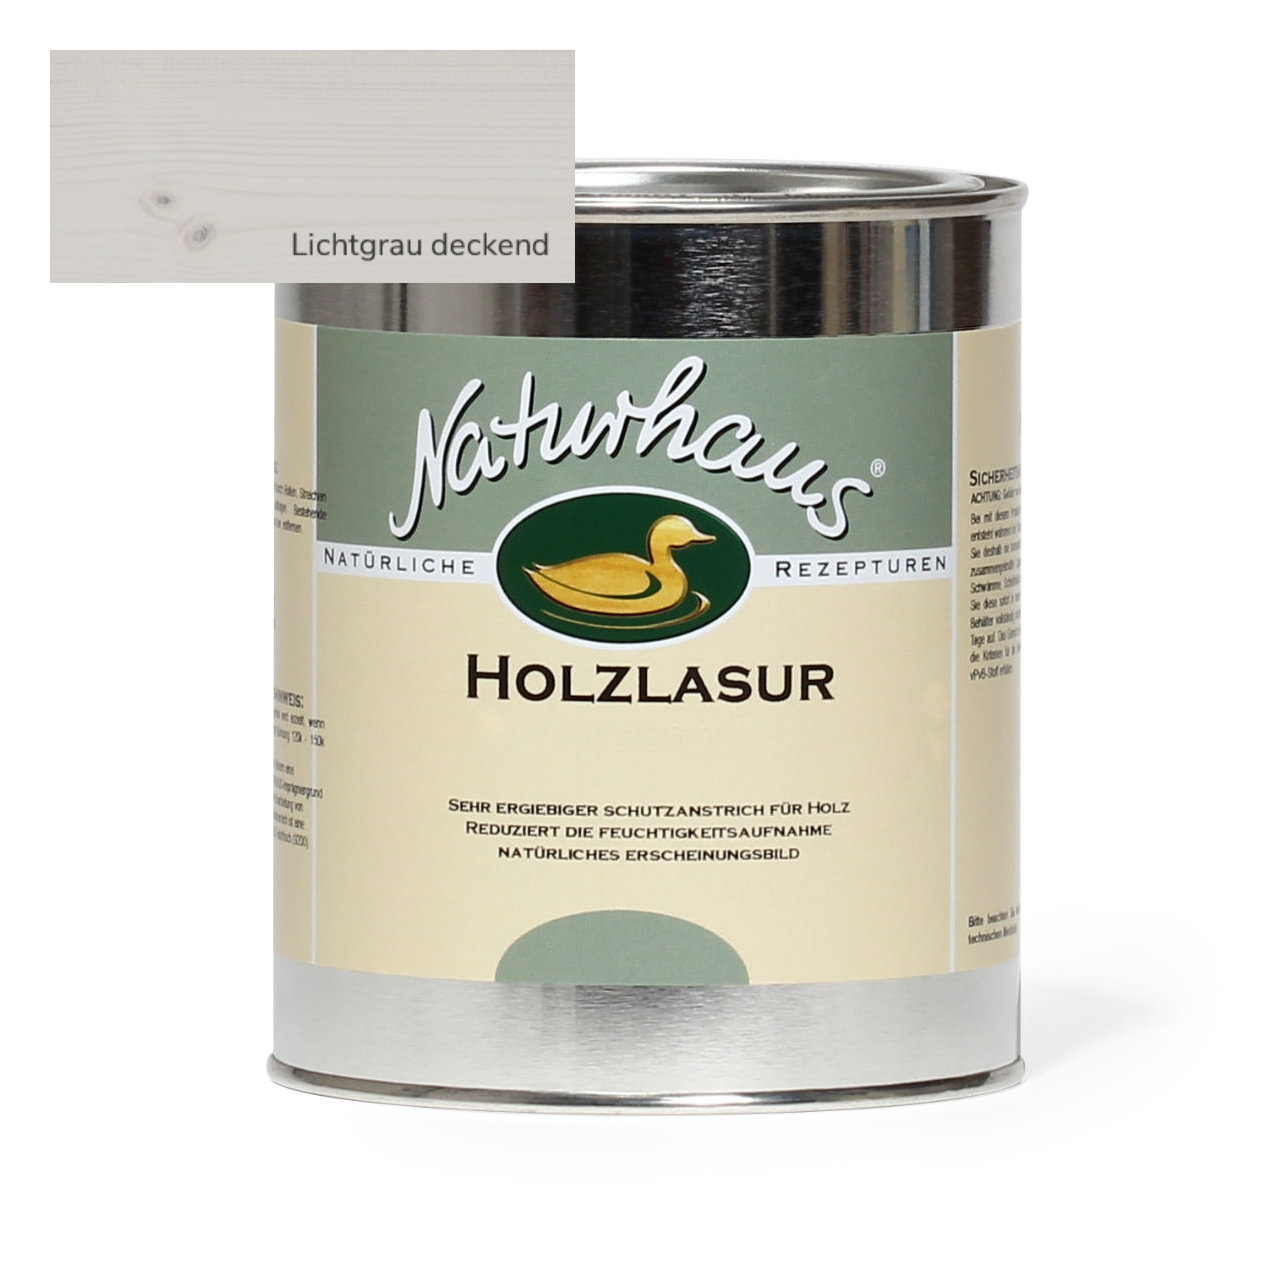 naturhaus holzlasur f r au en lichtgrau deckend naturhaus direkt. Black Bedroom Furniture Sets. Home Design Ideas